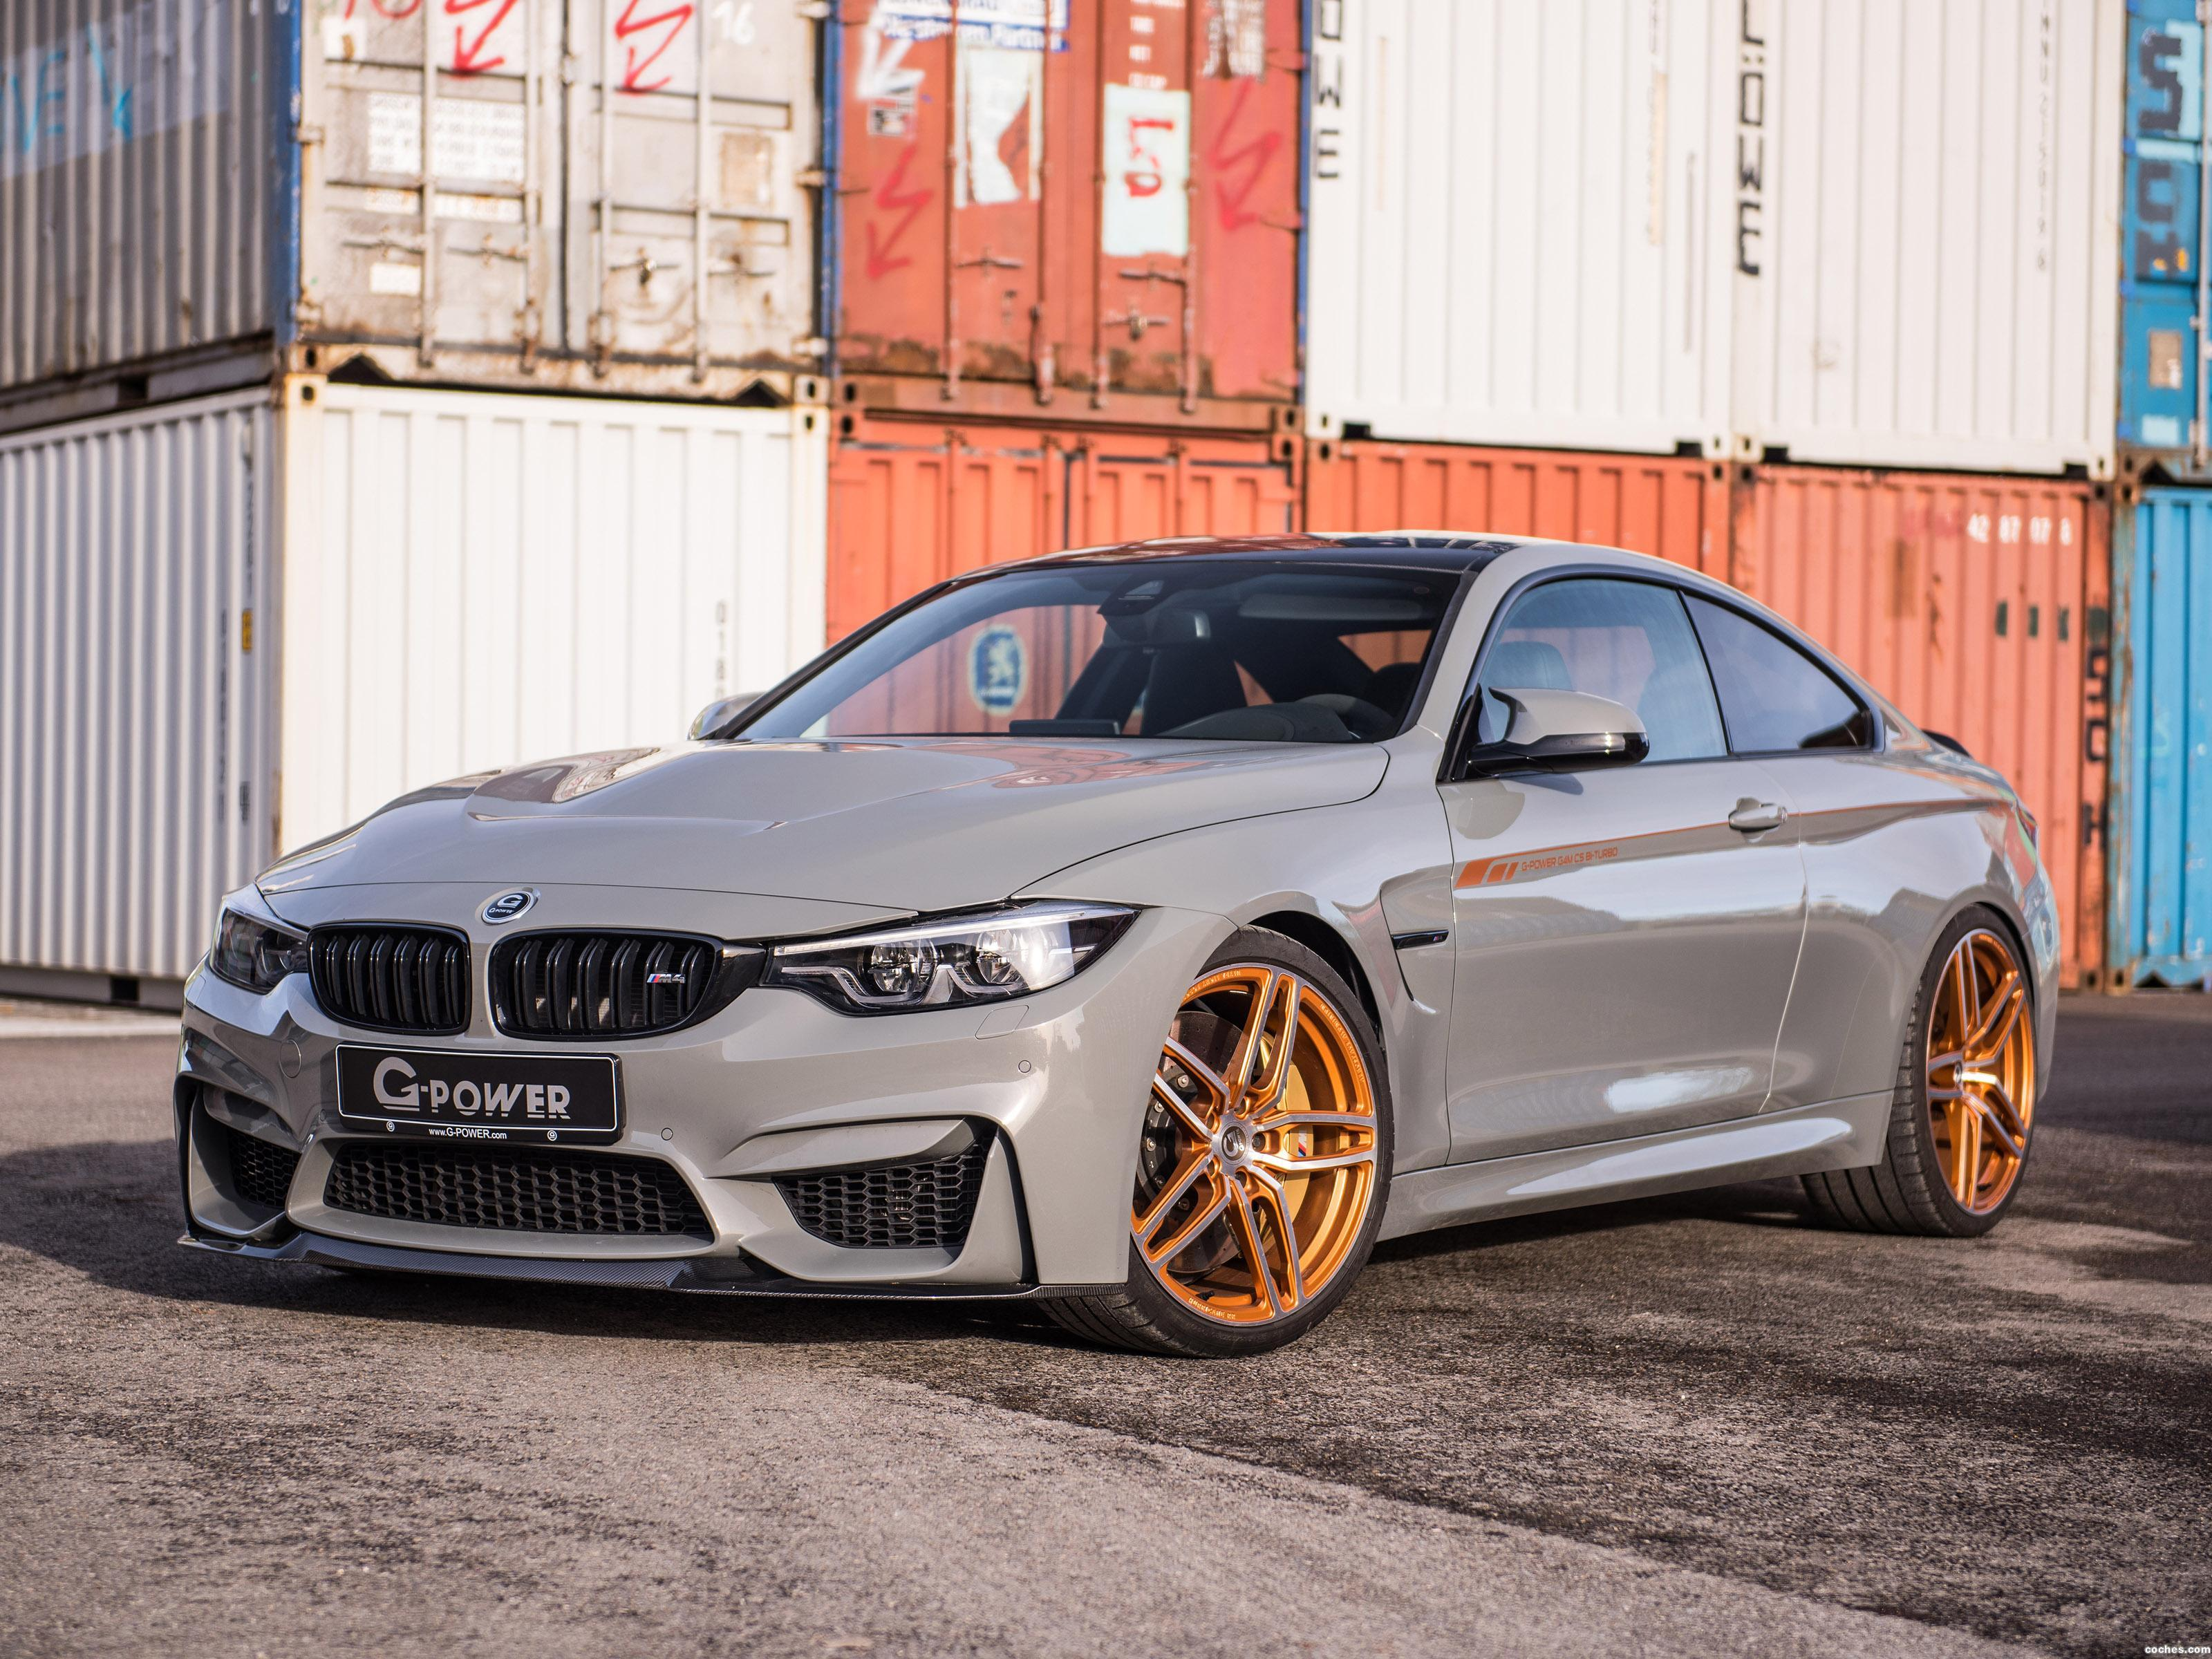 Foto 0 de BMW M4 CS G-Power (F82) 2018